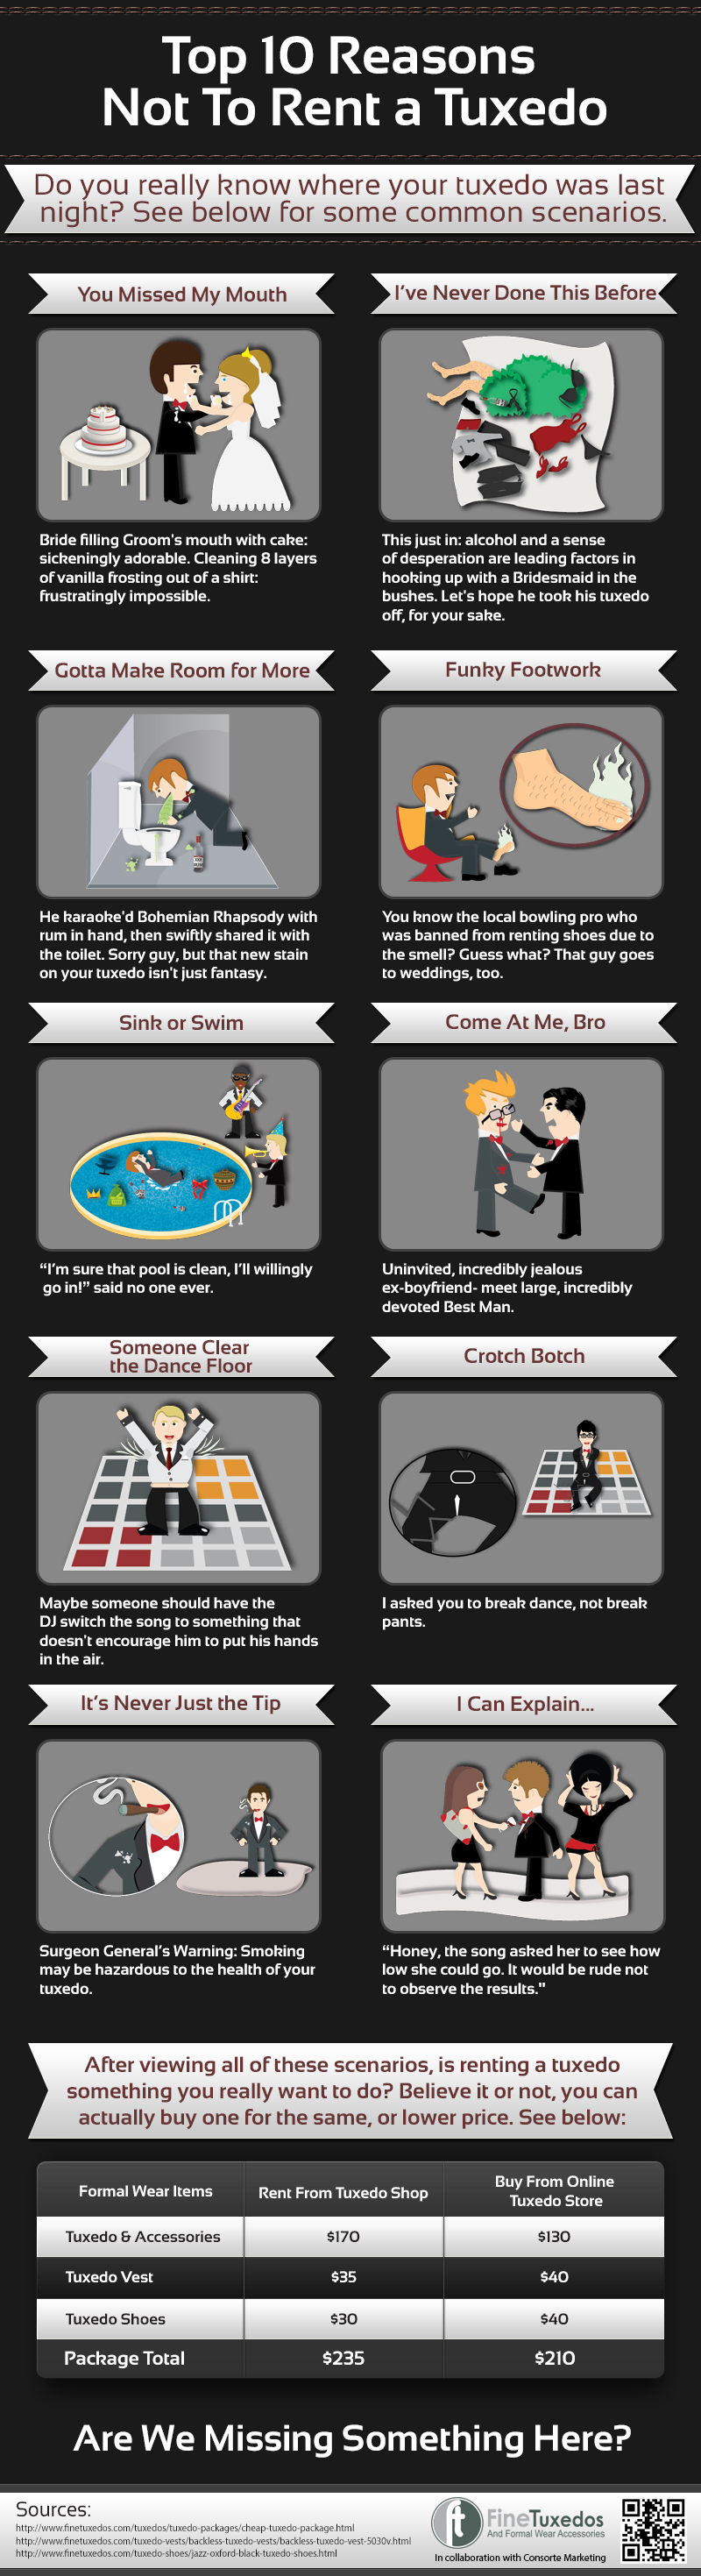 Top Ten Reasons Not to Rent a Tuxedo